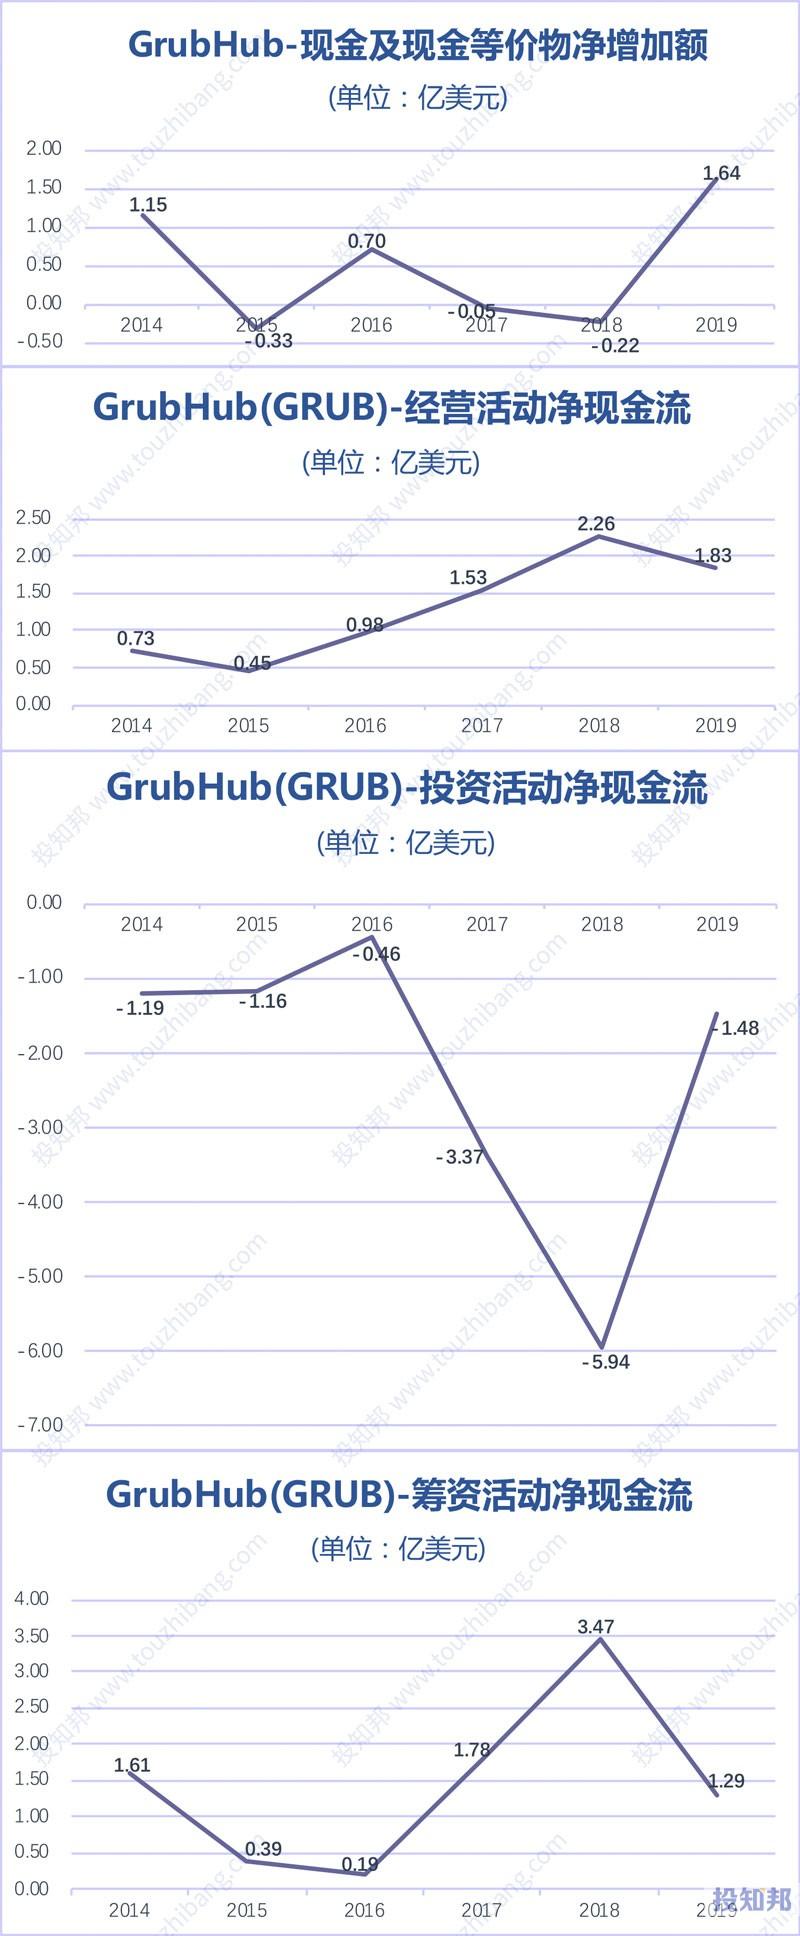 GrubHub(GRUB)财报数据图示(2014年~2020年Q1,更新)